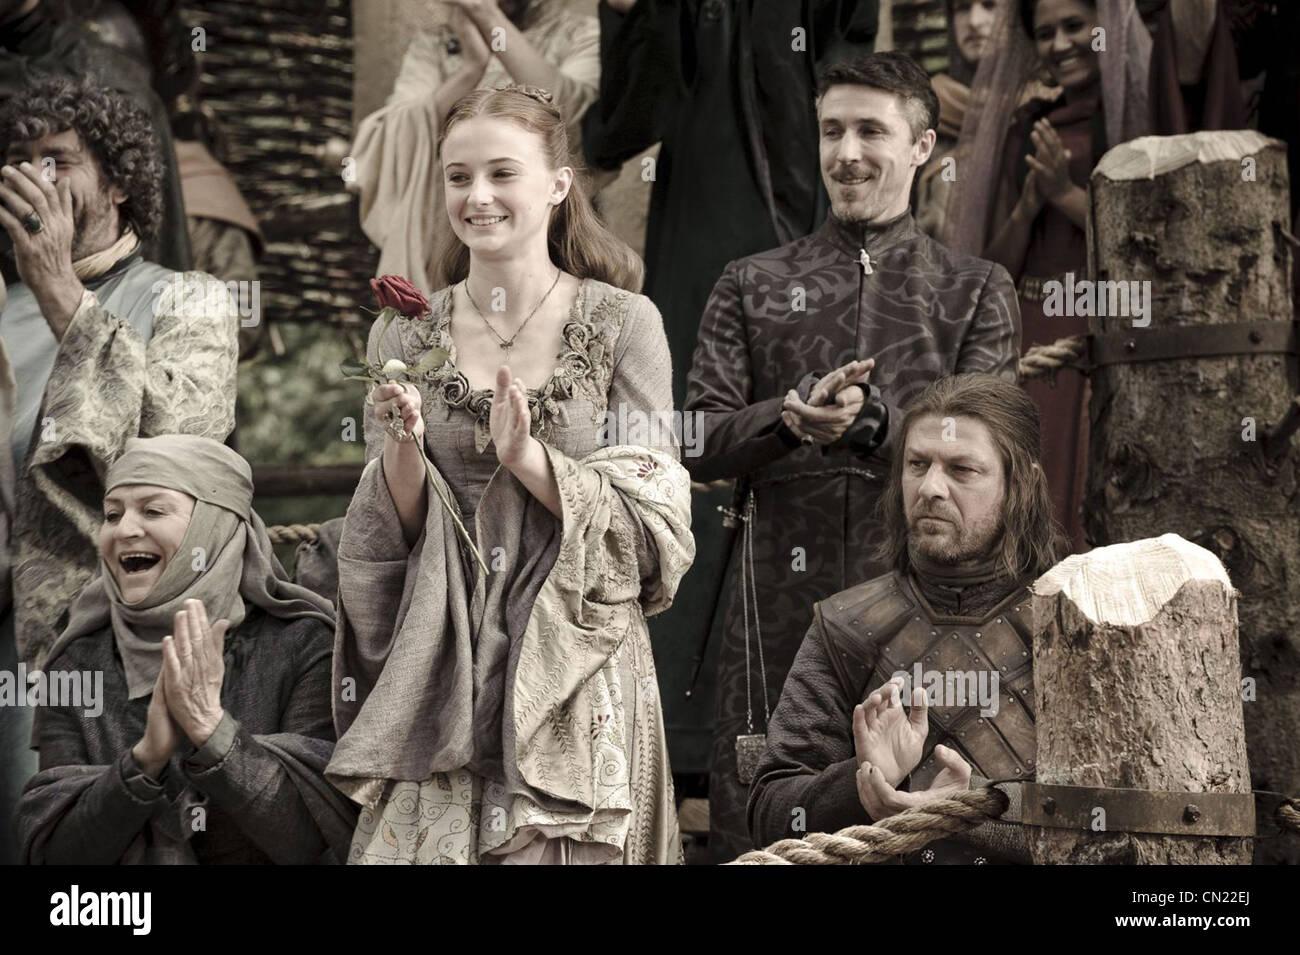 GAME OF THRONES (TV) (2011) SOPHIE TURNER, SEAN BEAN, 004 MOVIESTORE COLLECTION LTD - Stock Image